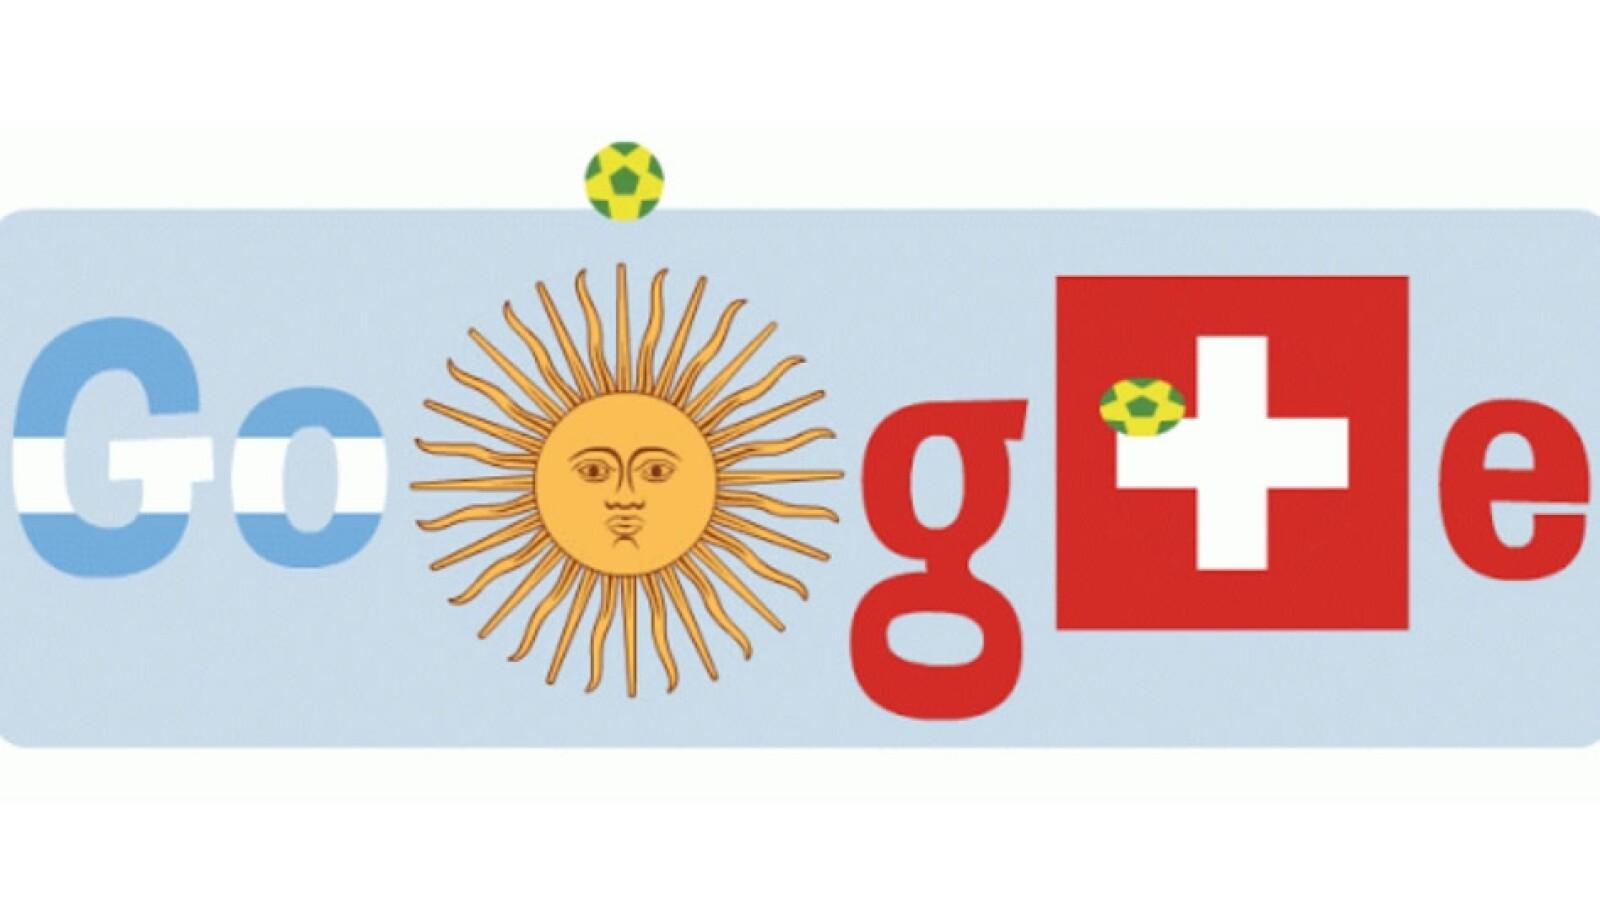 Google doodle 46